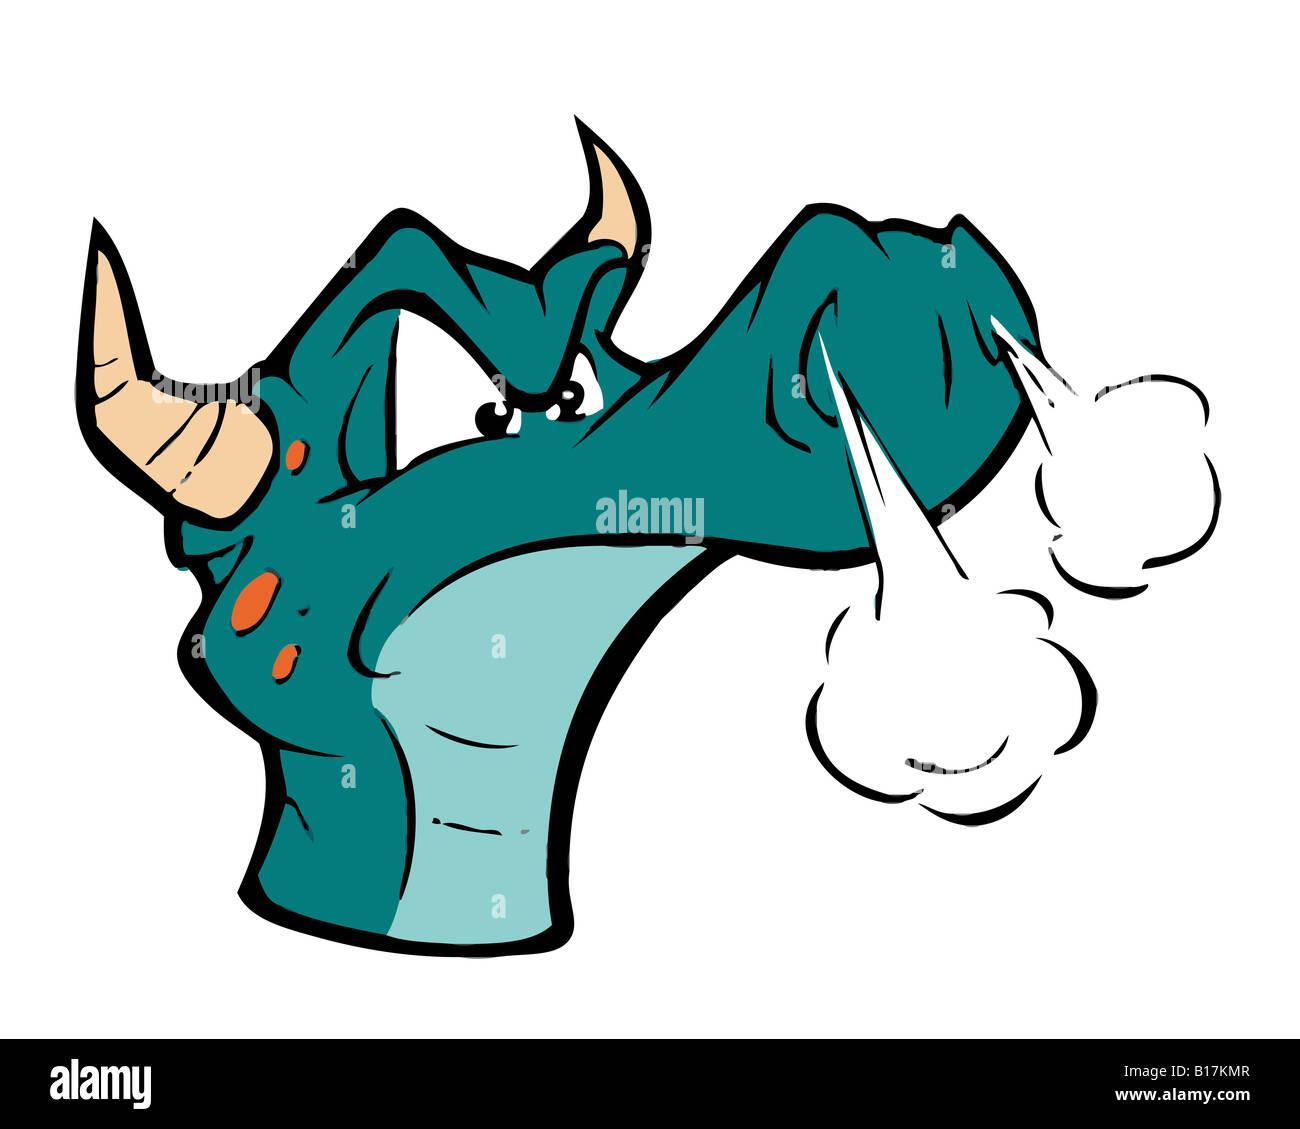 cartoon illustration of a dragon - Stock Image